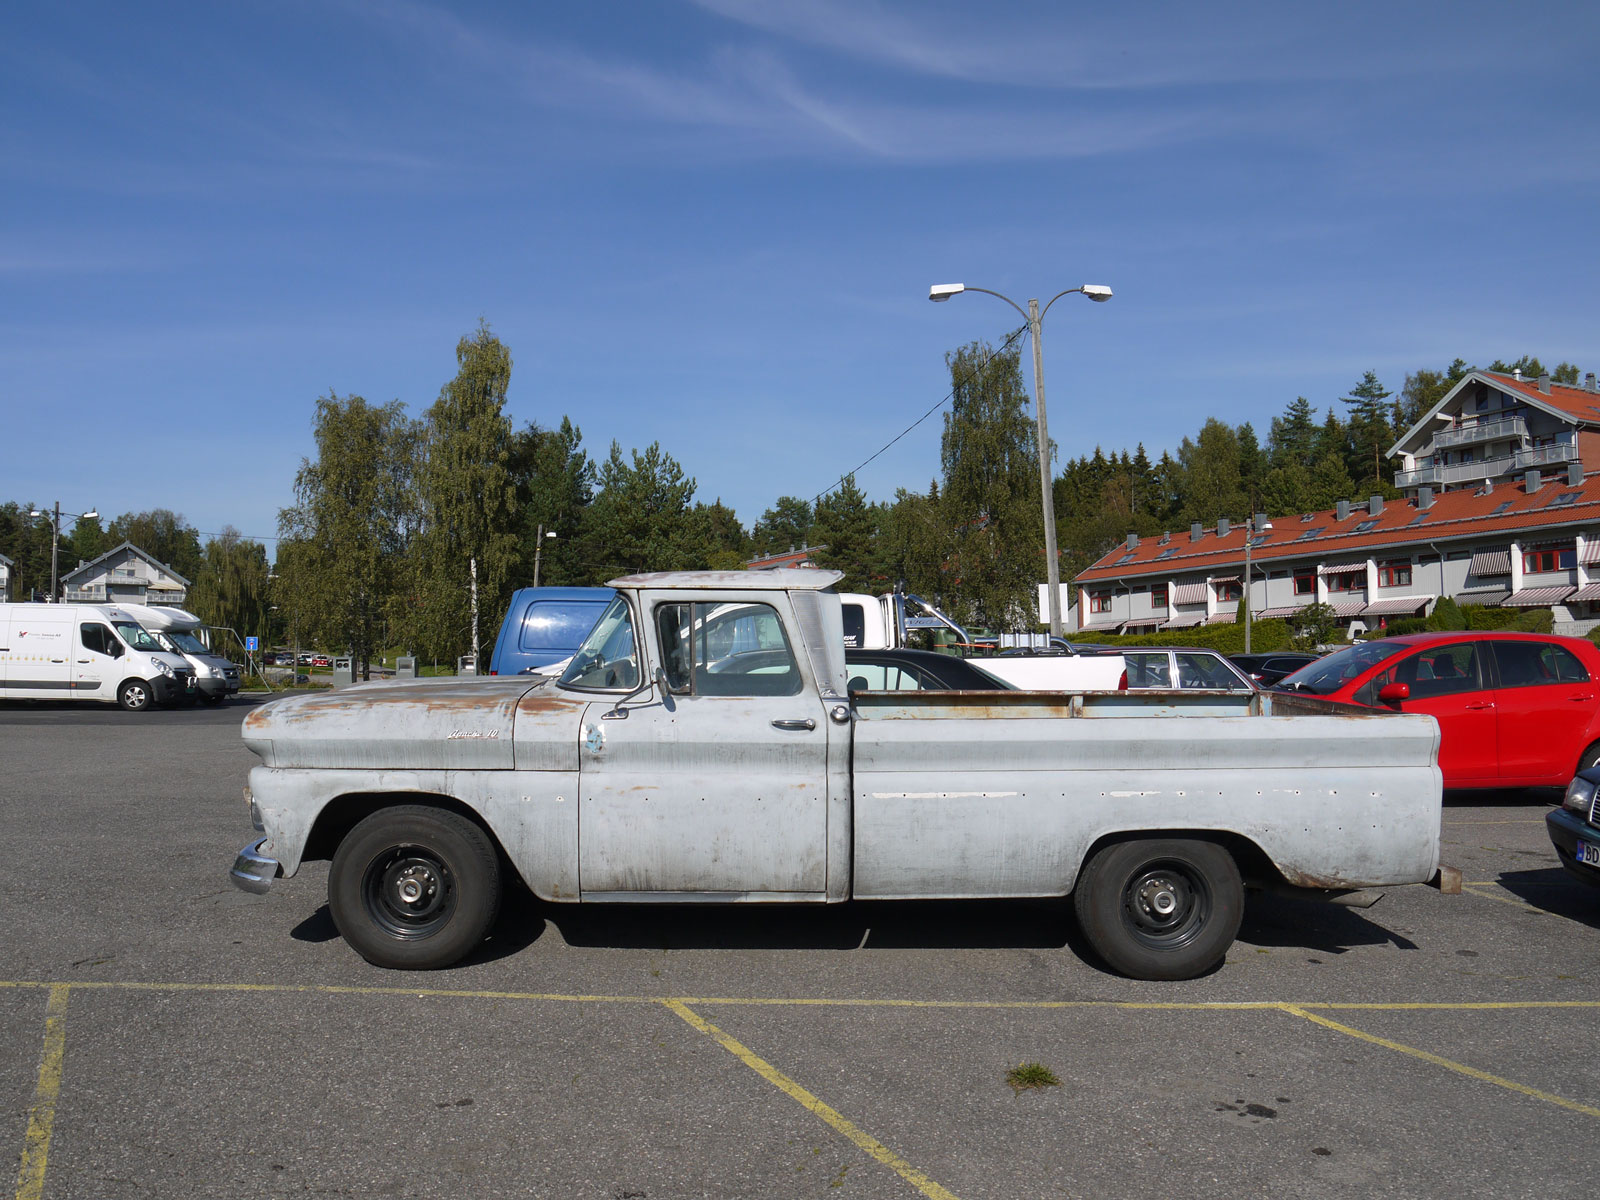 1961 Chevrolet Fleetside Pickup Oslo Norway parked cars